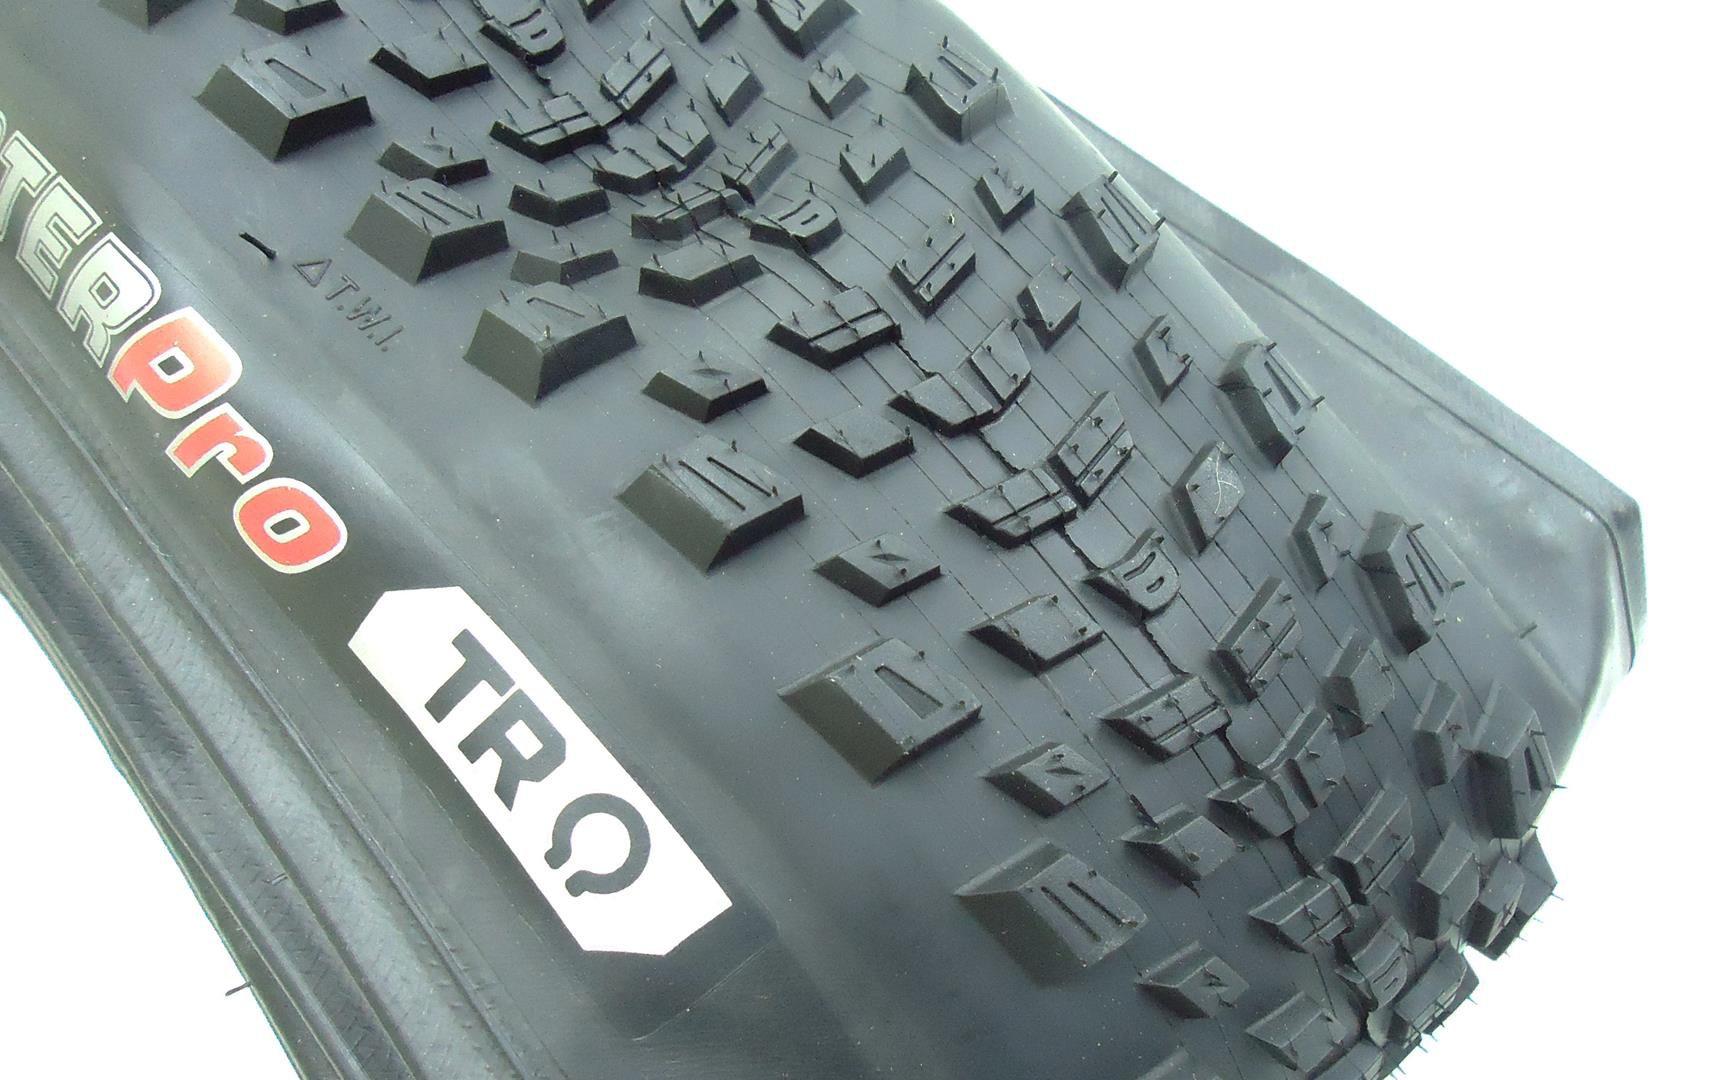 Pneu Bicicleta Mountain Bike Kenda Booster Pro TR 29x2.20 Tubeless 580 gramas 120tpi